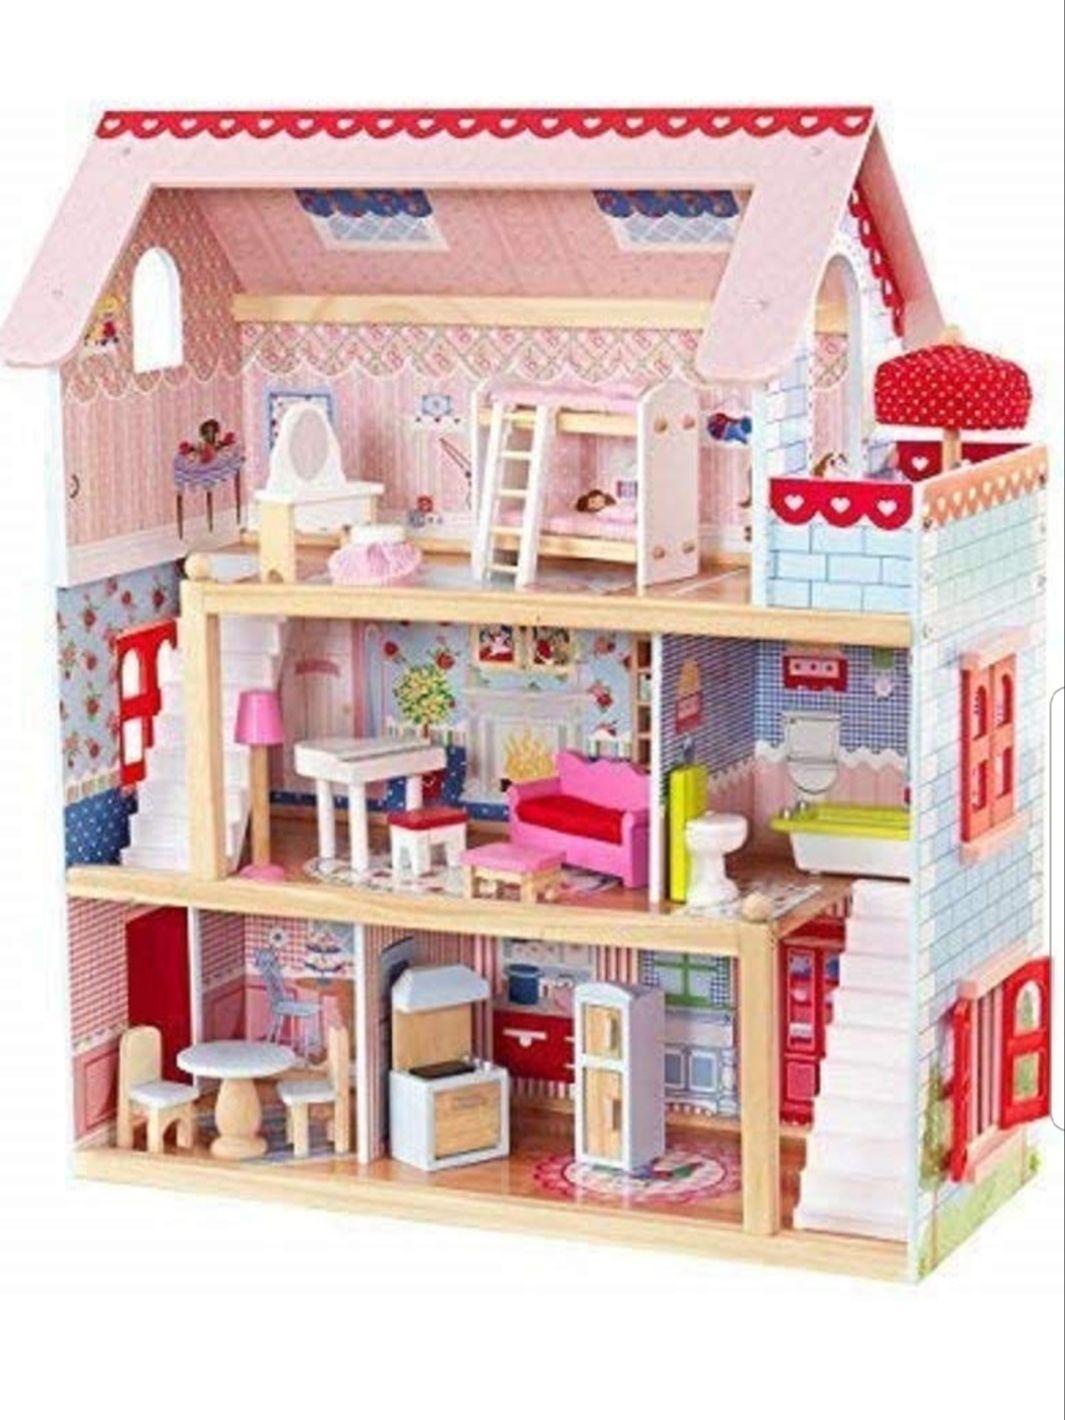 Casa de muñecas de madera de 3 plantas